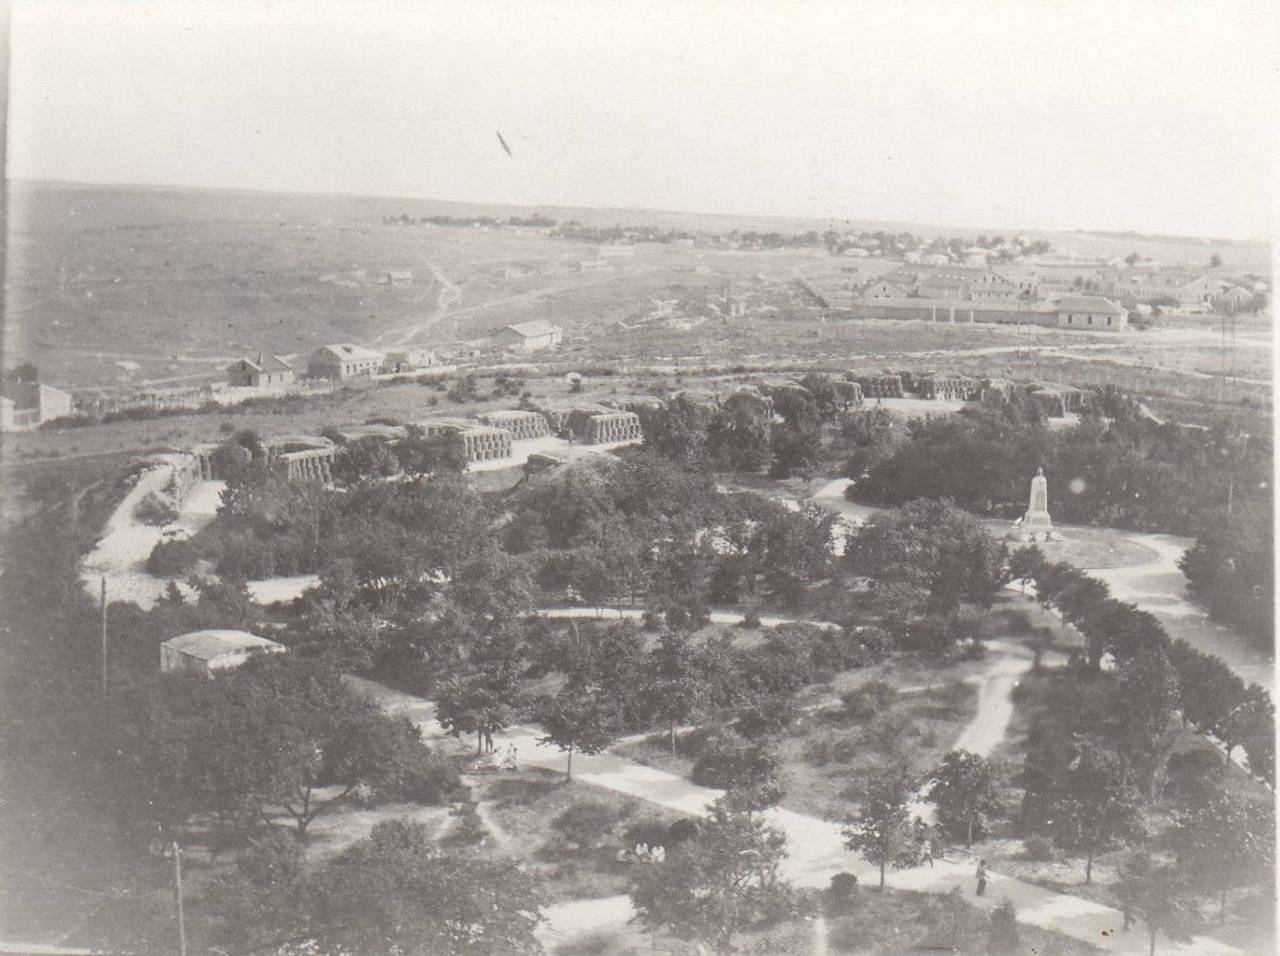 1920. Вид со здания Панорамы